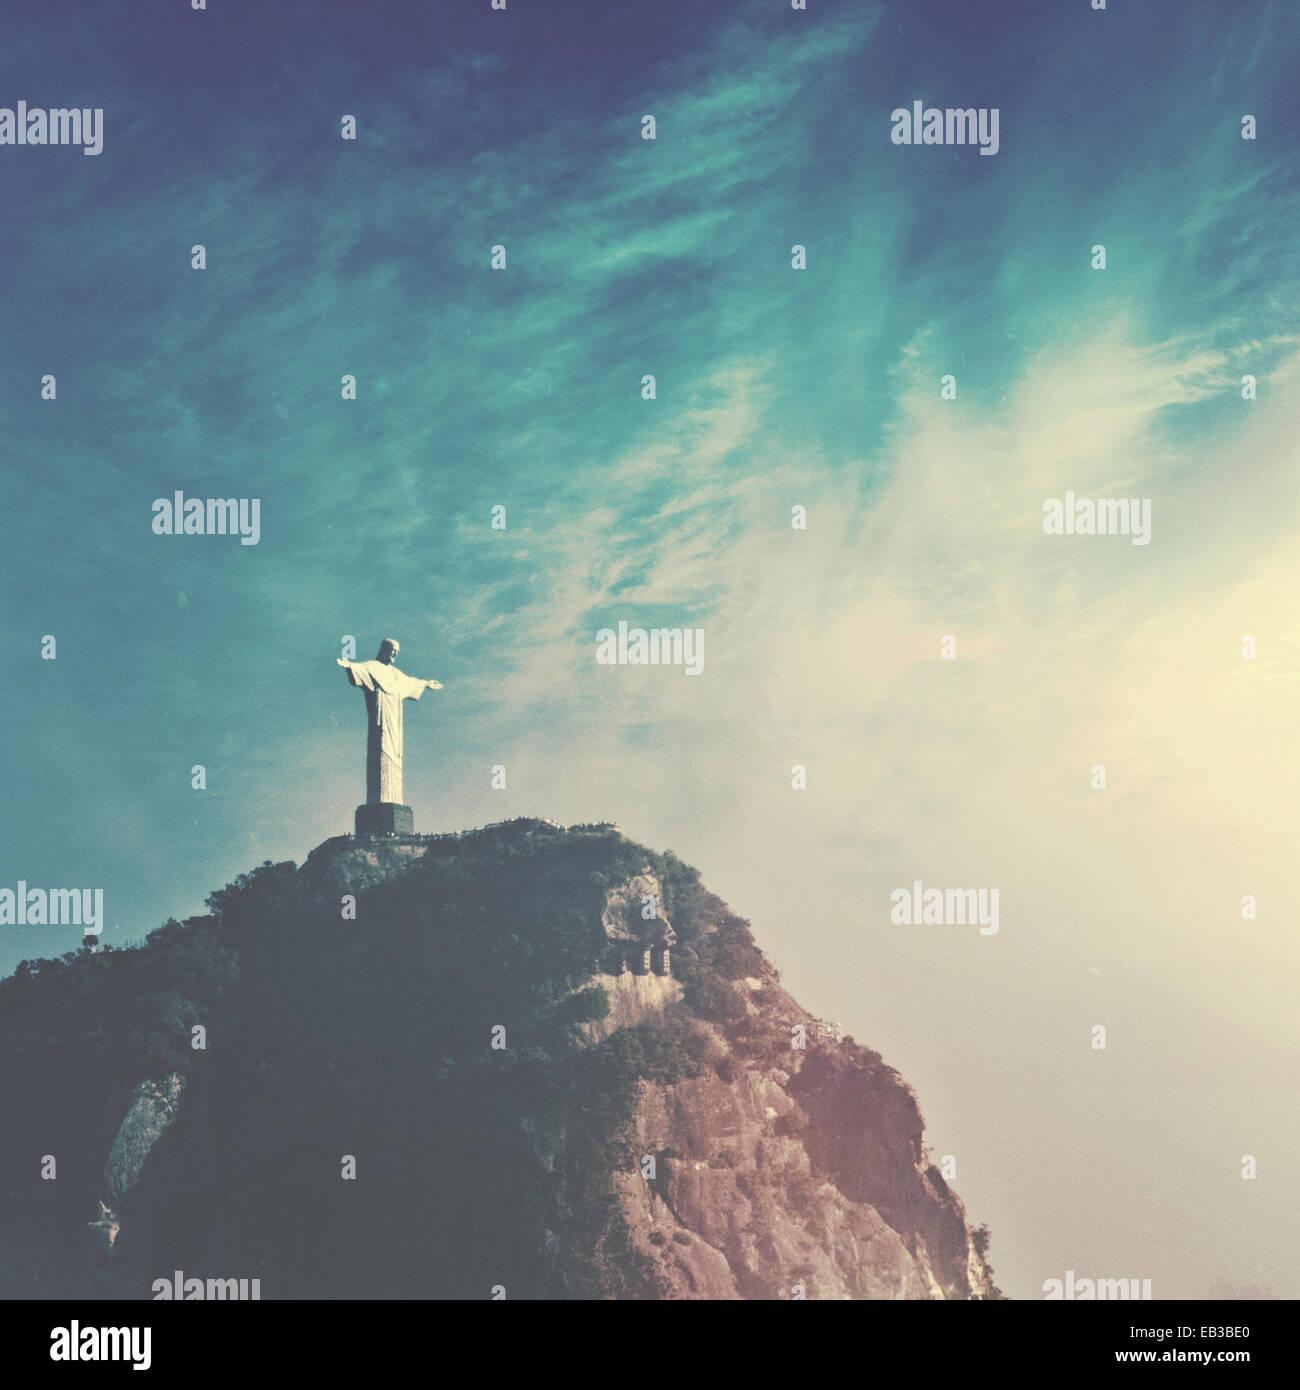 Brazil, Rio de Janeiro, Christ the Redeemer - Stock Image